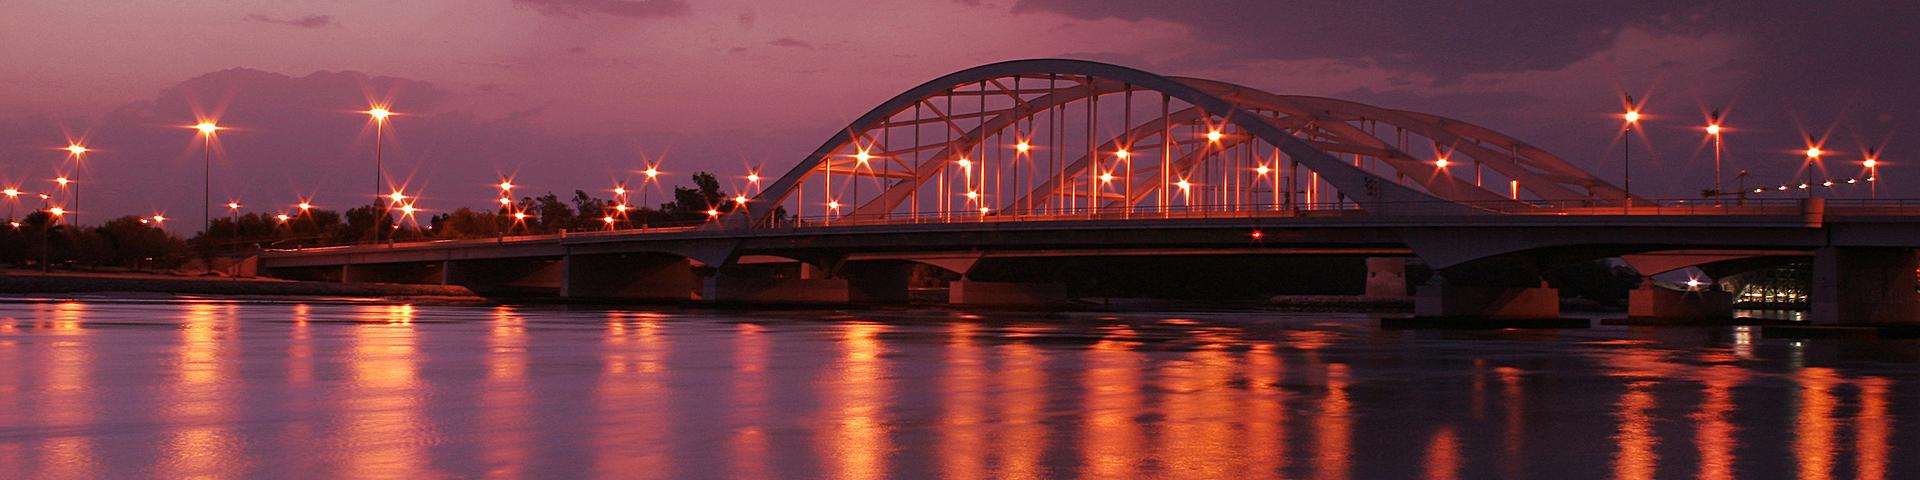 AlMaqta Bridge